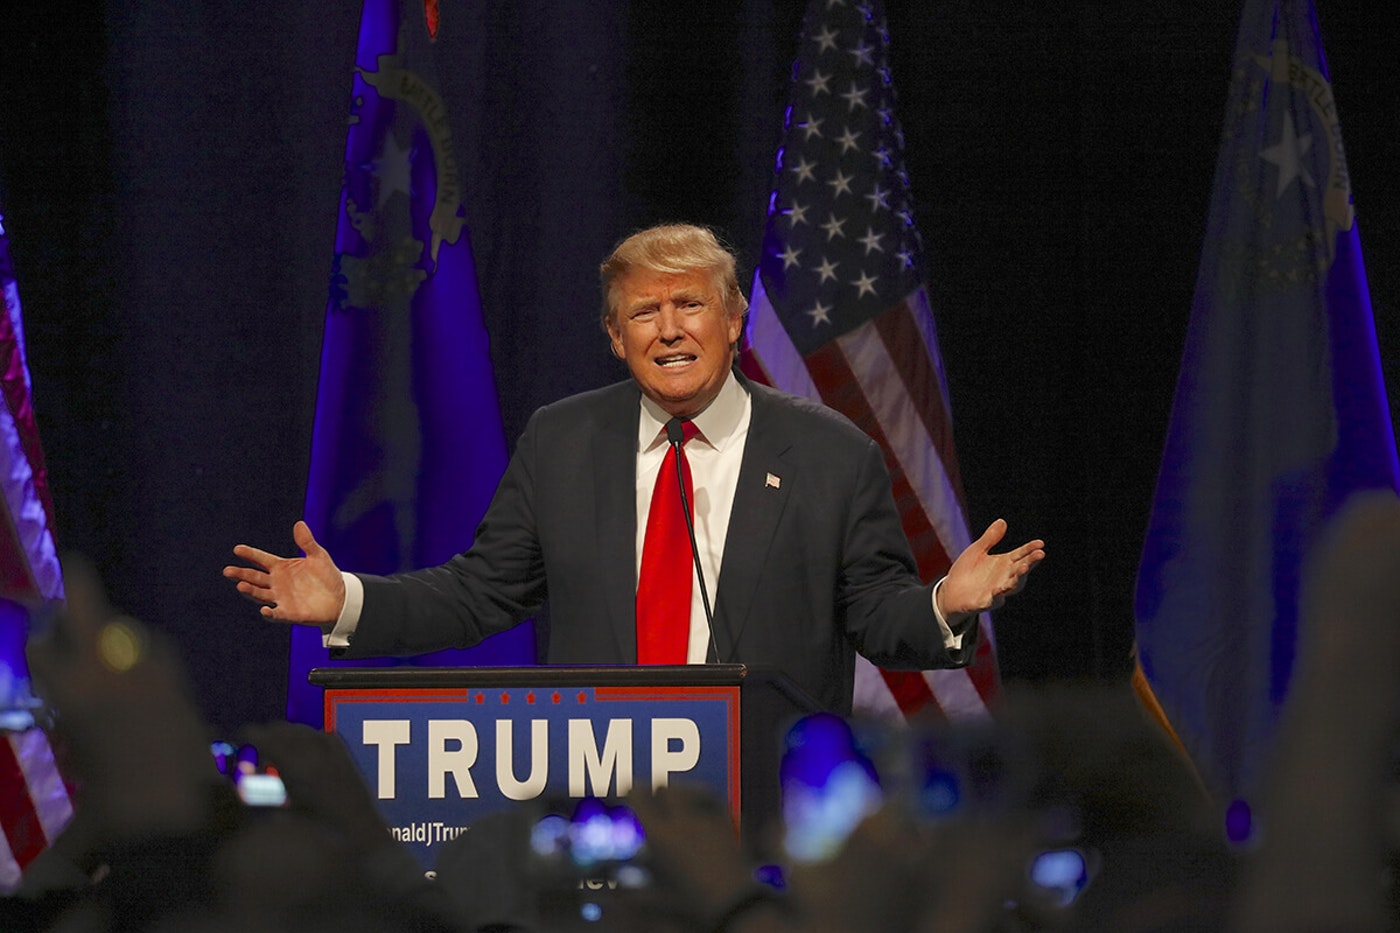 Trump speaking at campaign event